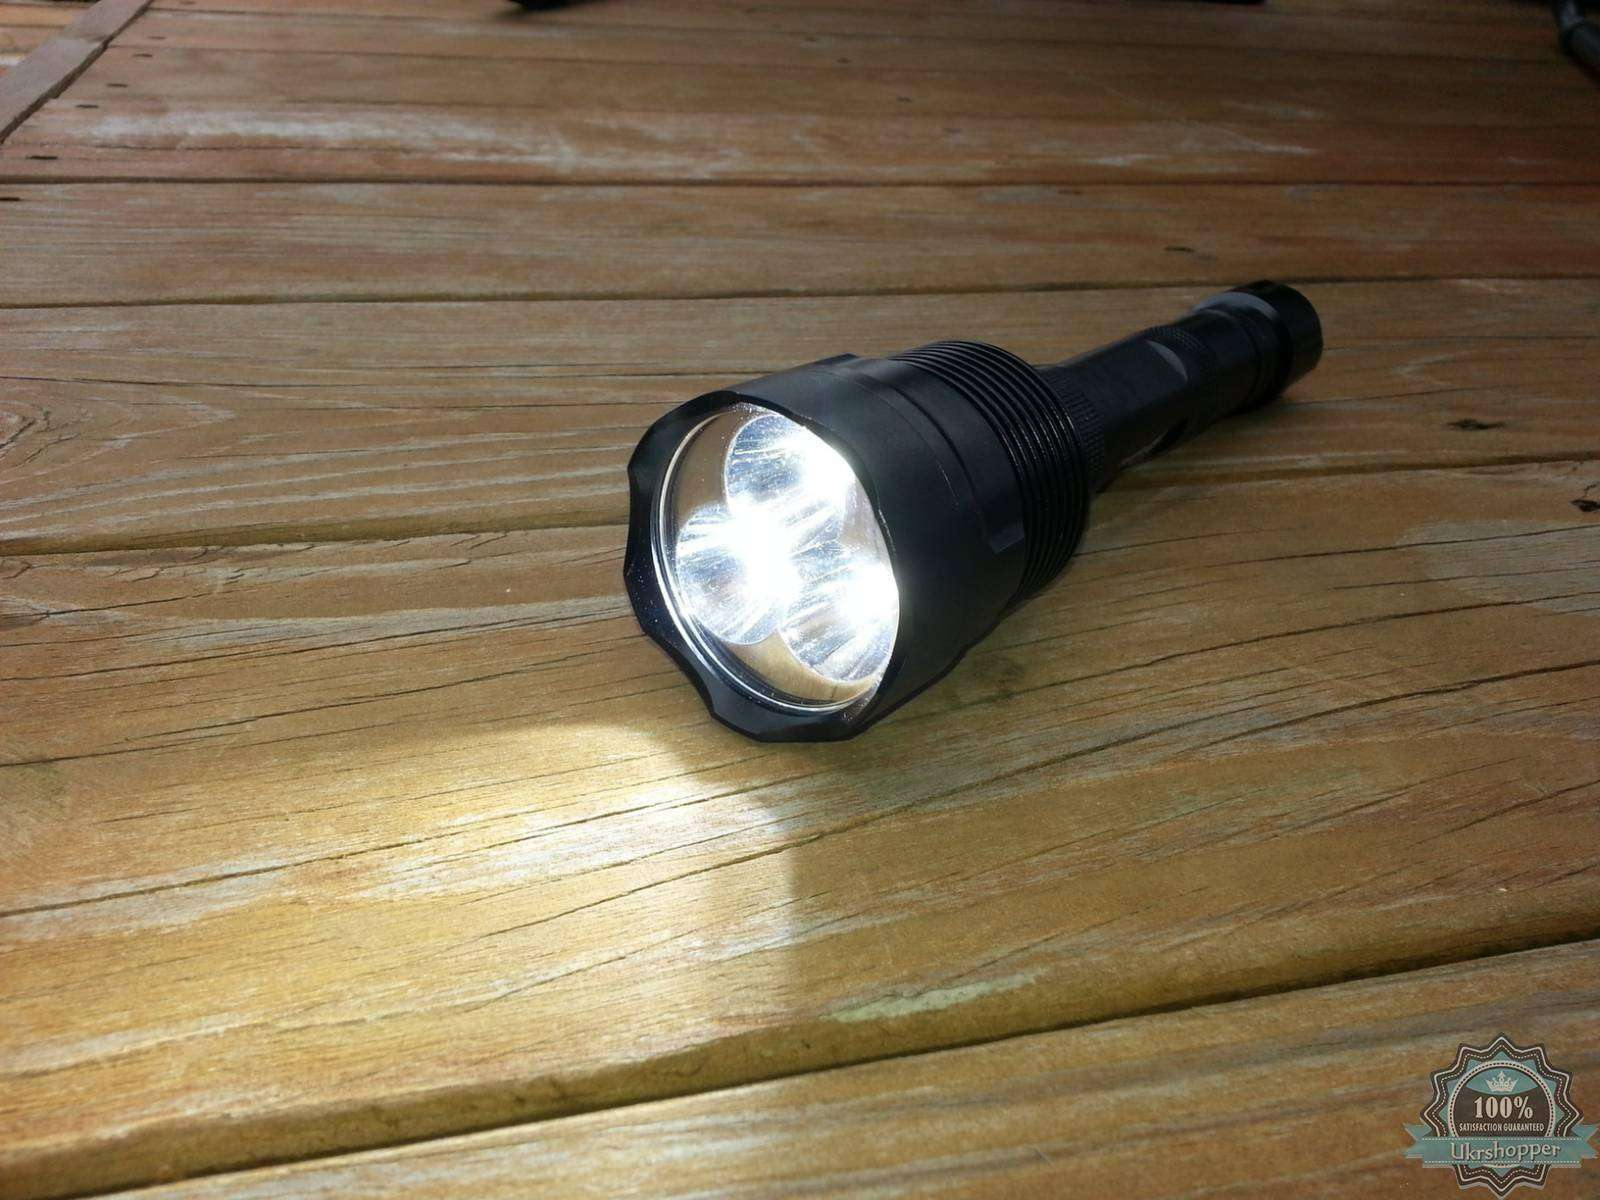 Tmart: Обзор мощного фонаря TrustFire CREE XM-L T6 5-Modes 3800LM